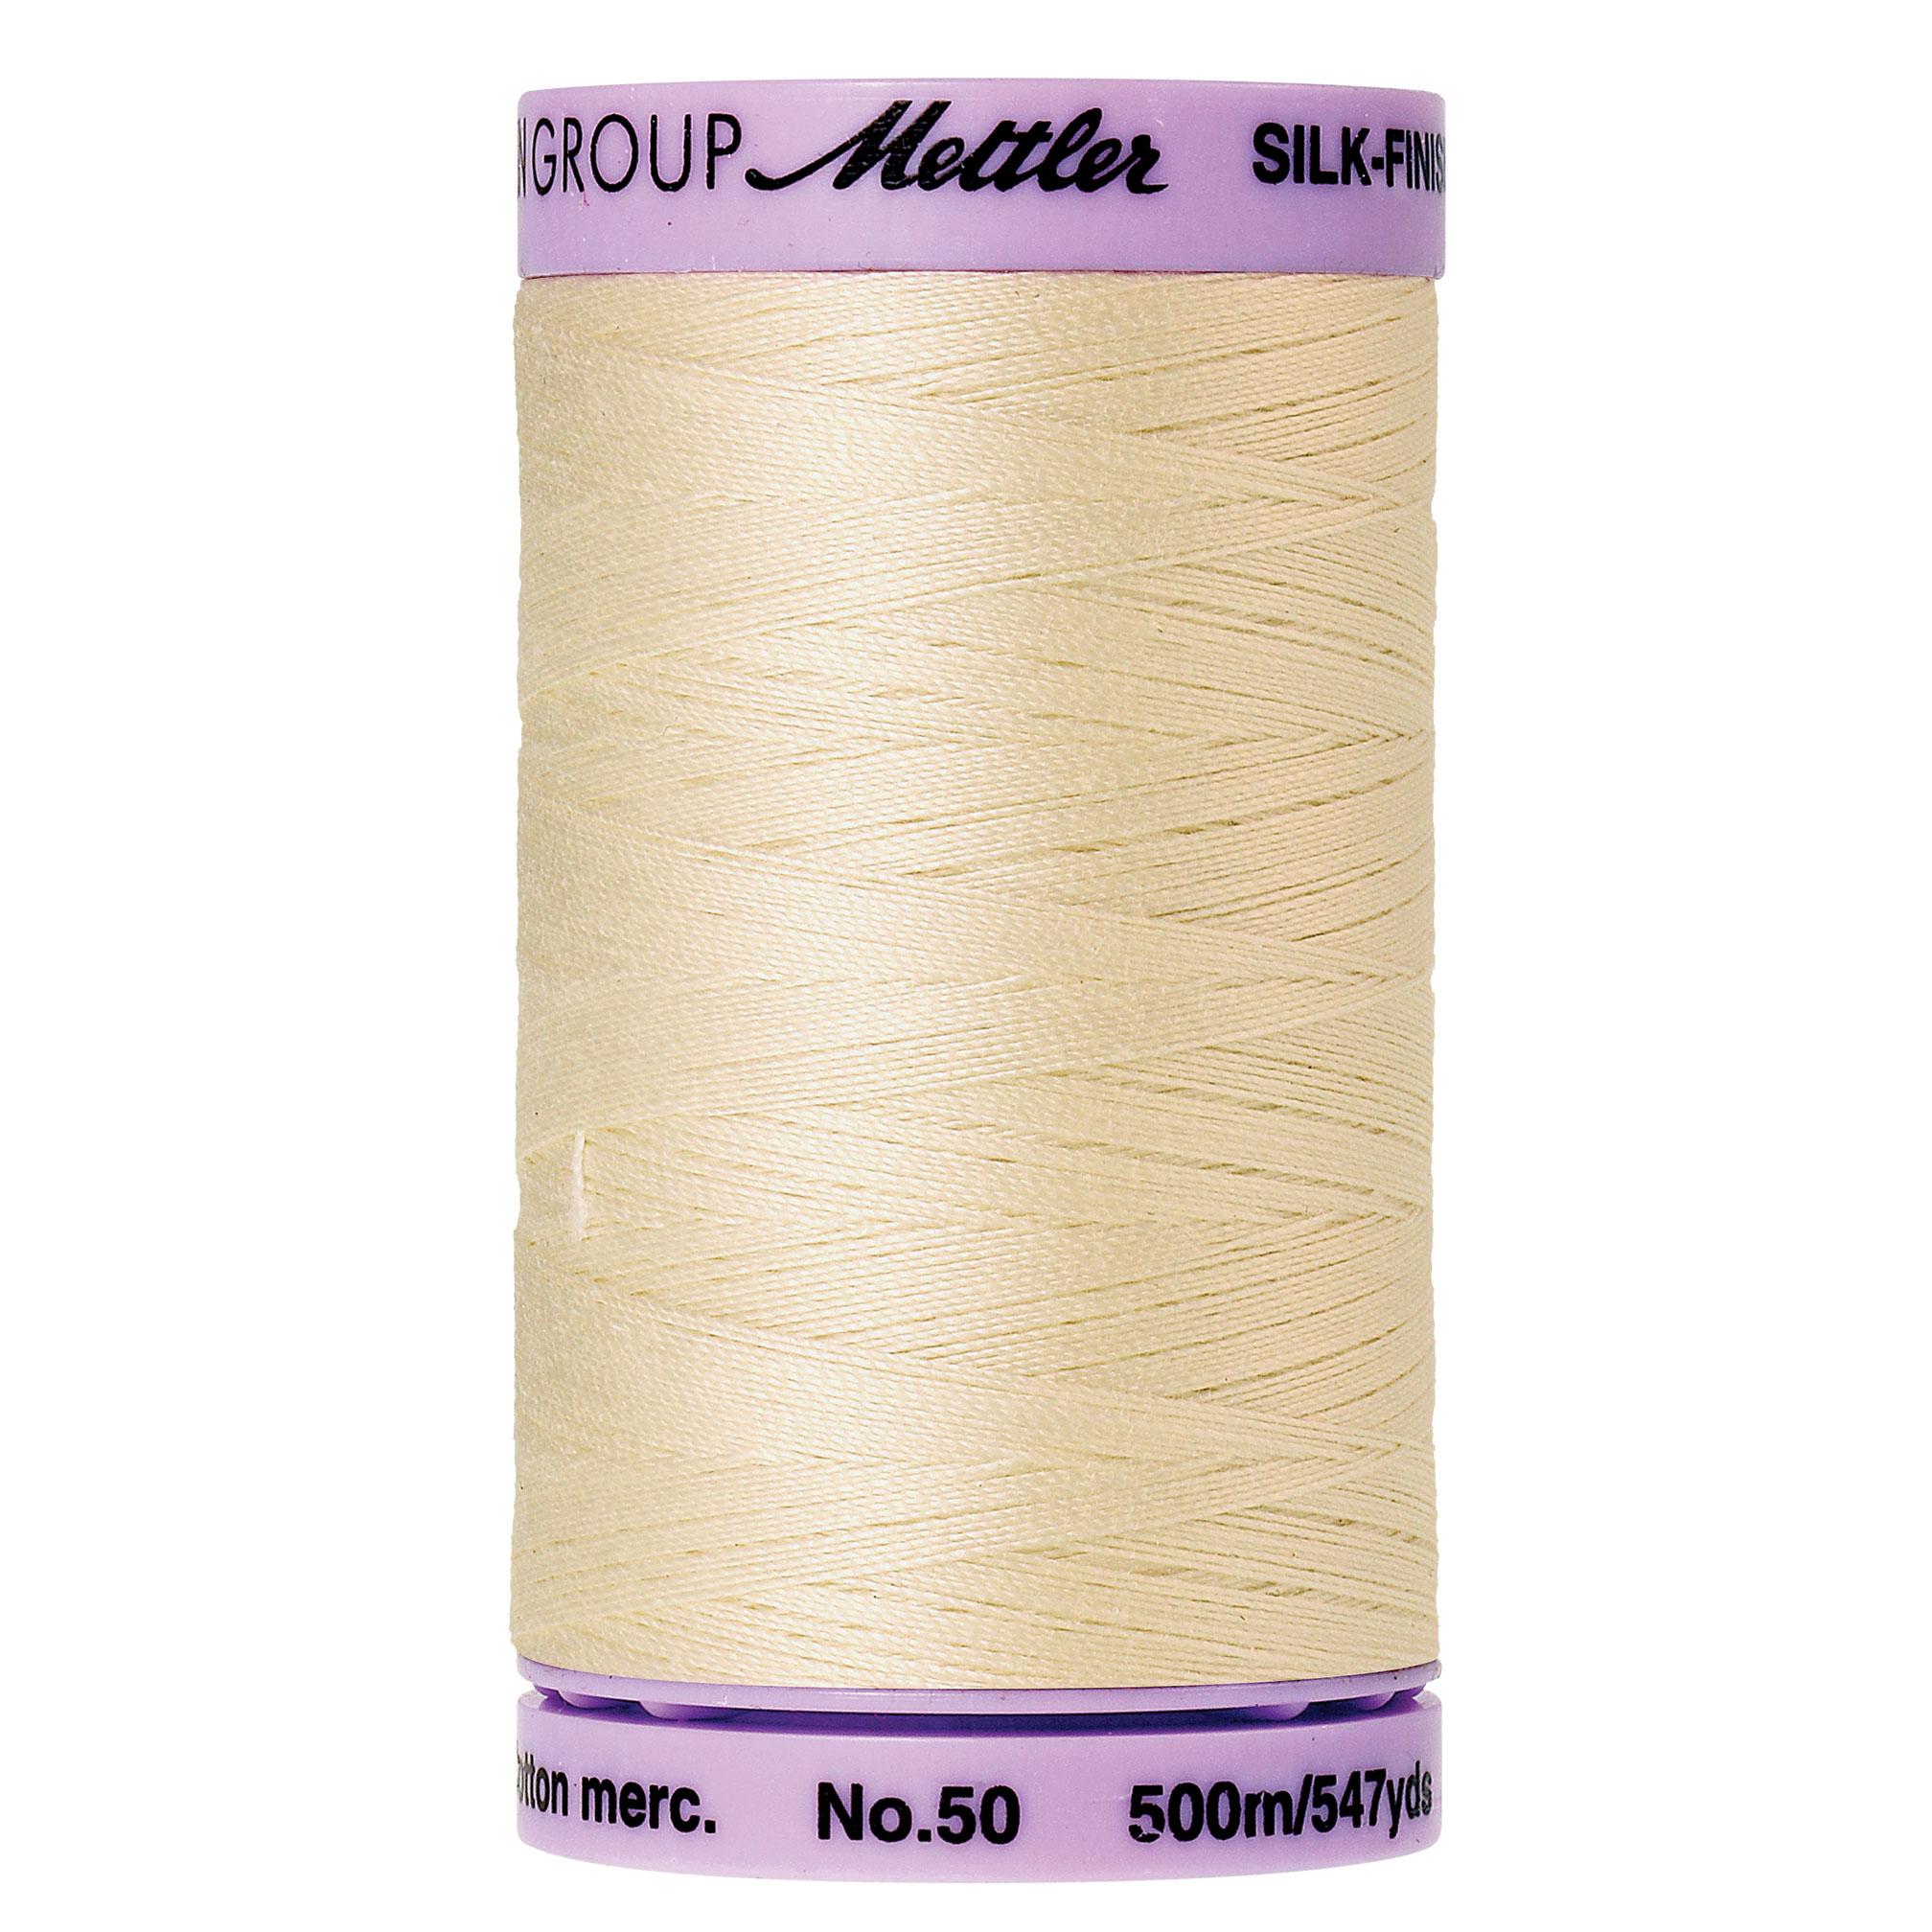 Mettler Silk-Finish 50wt Cotton Thread 547yd.  9104-0778